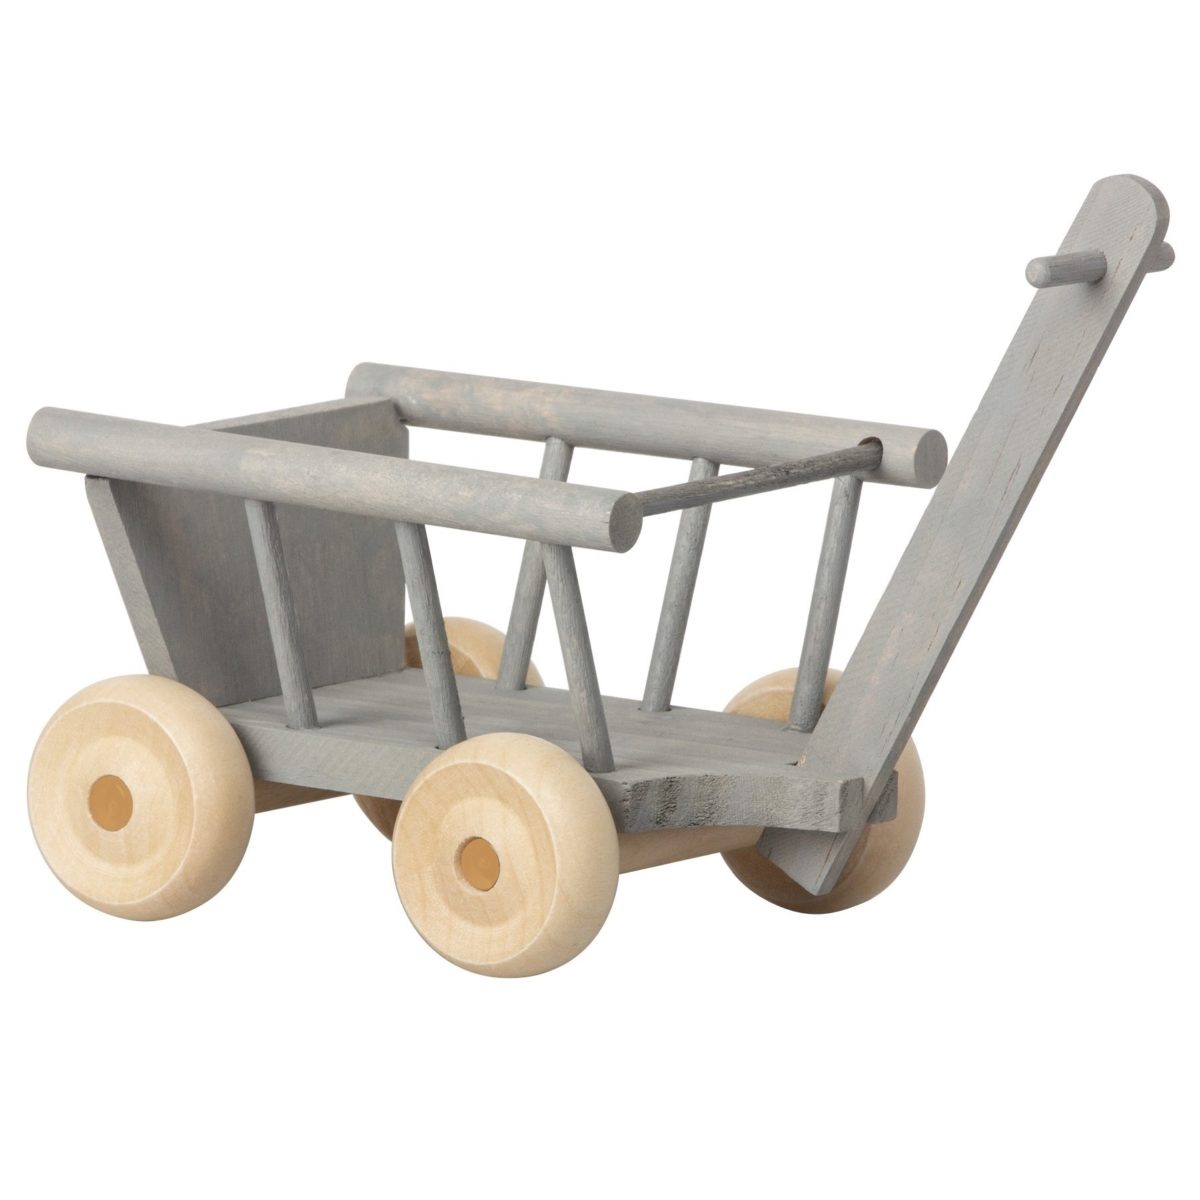 MAILEG wózek dla myszek